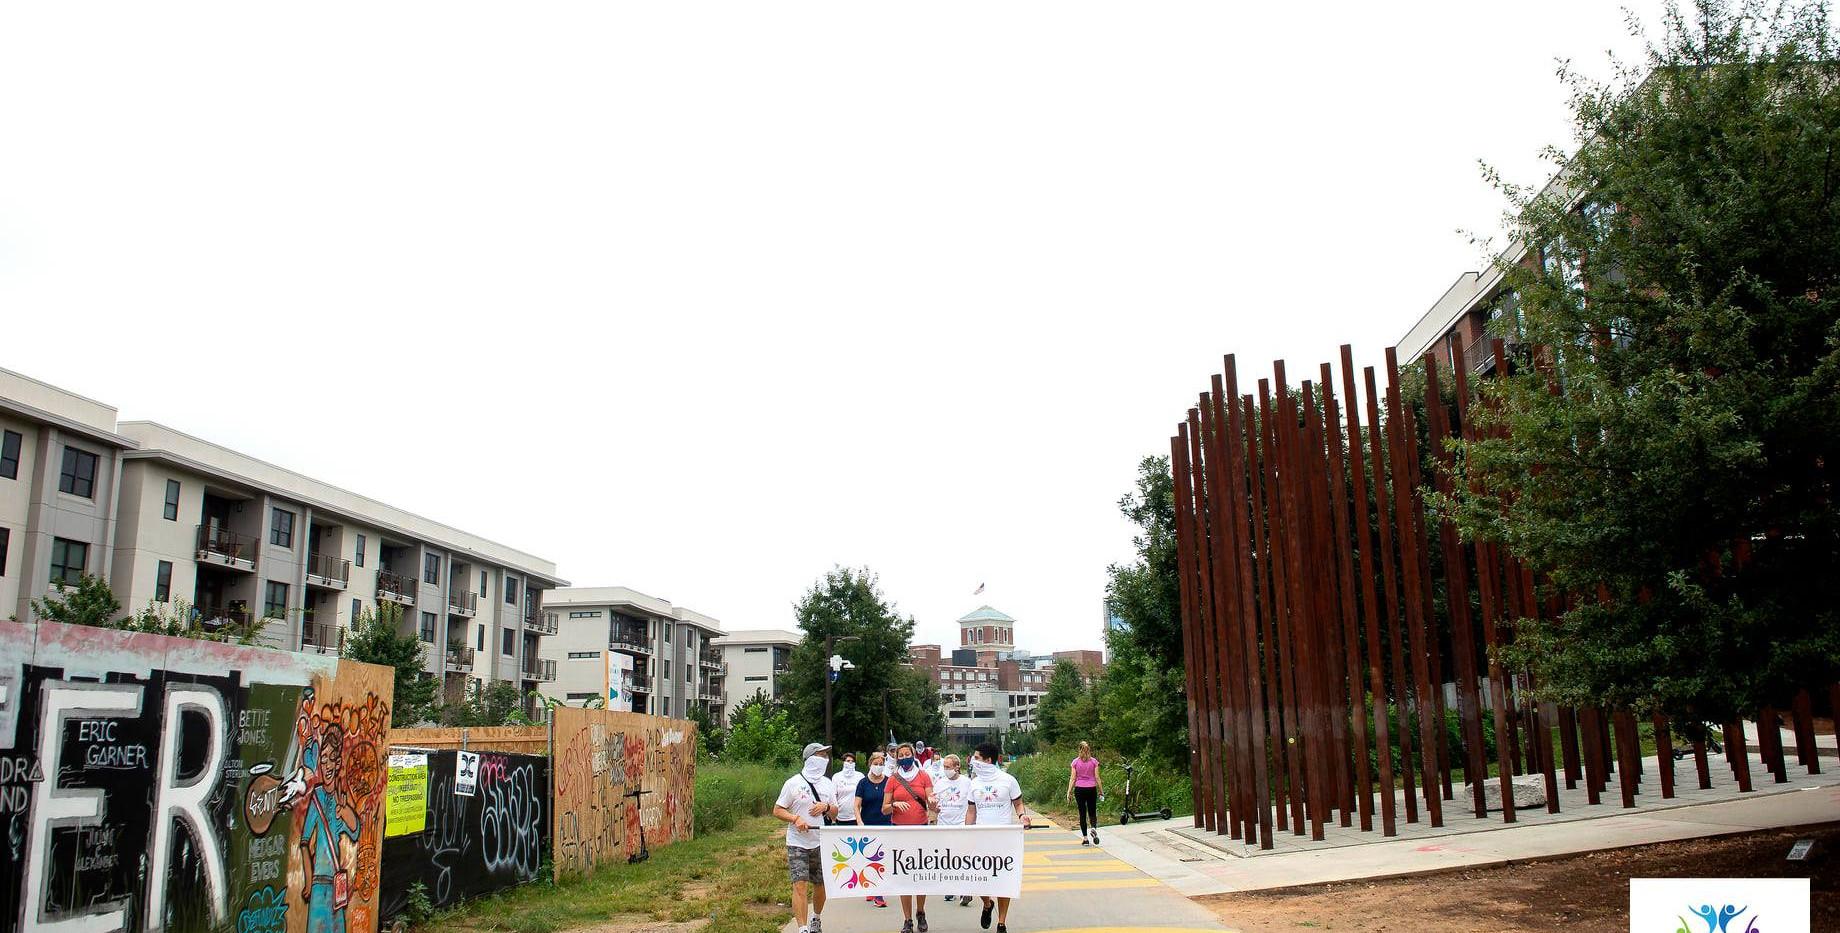 Walk For Education on Atlanta Beltline